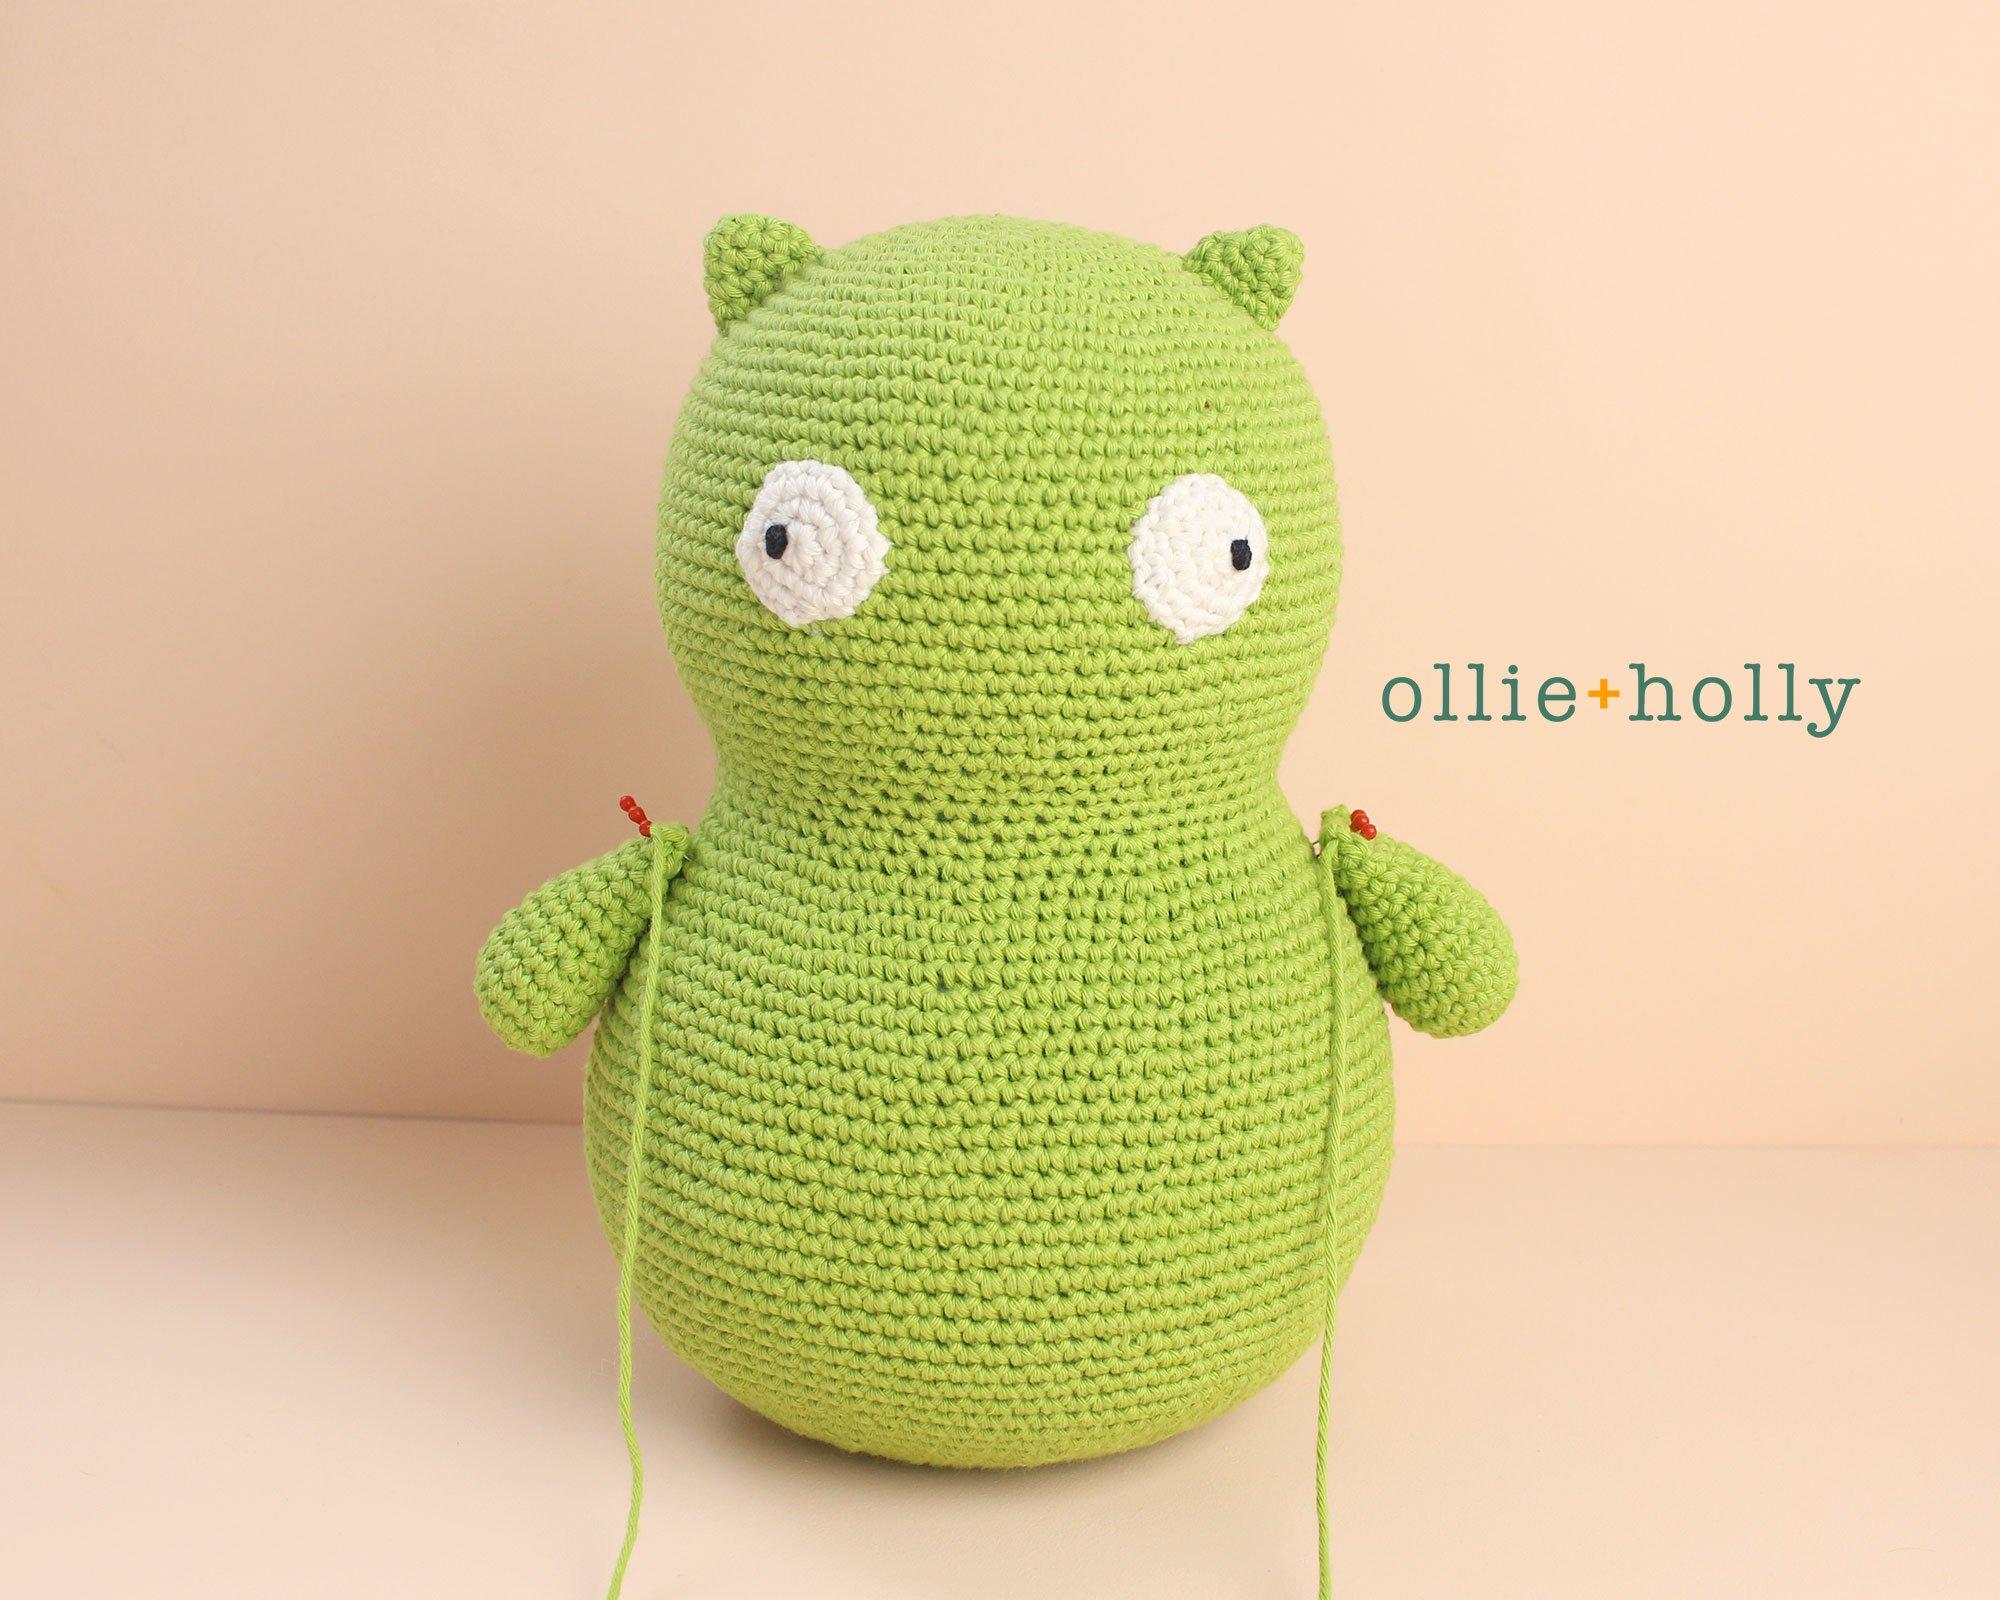 Free Louise Belcher's Stuffed Animal Kuchi Kopi (from Bob's Burgers) Amigurumi Crochet Pattern Step 10